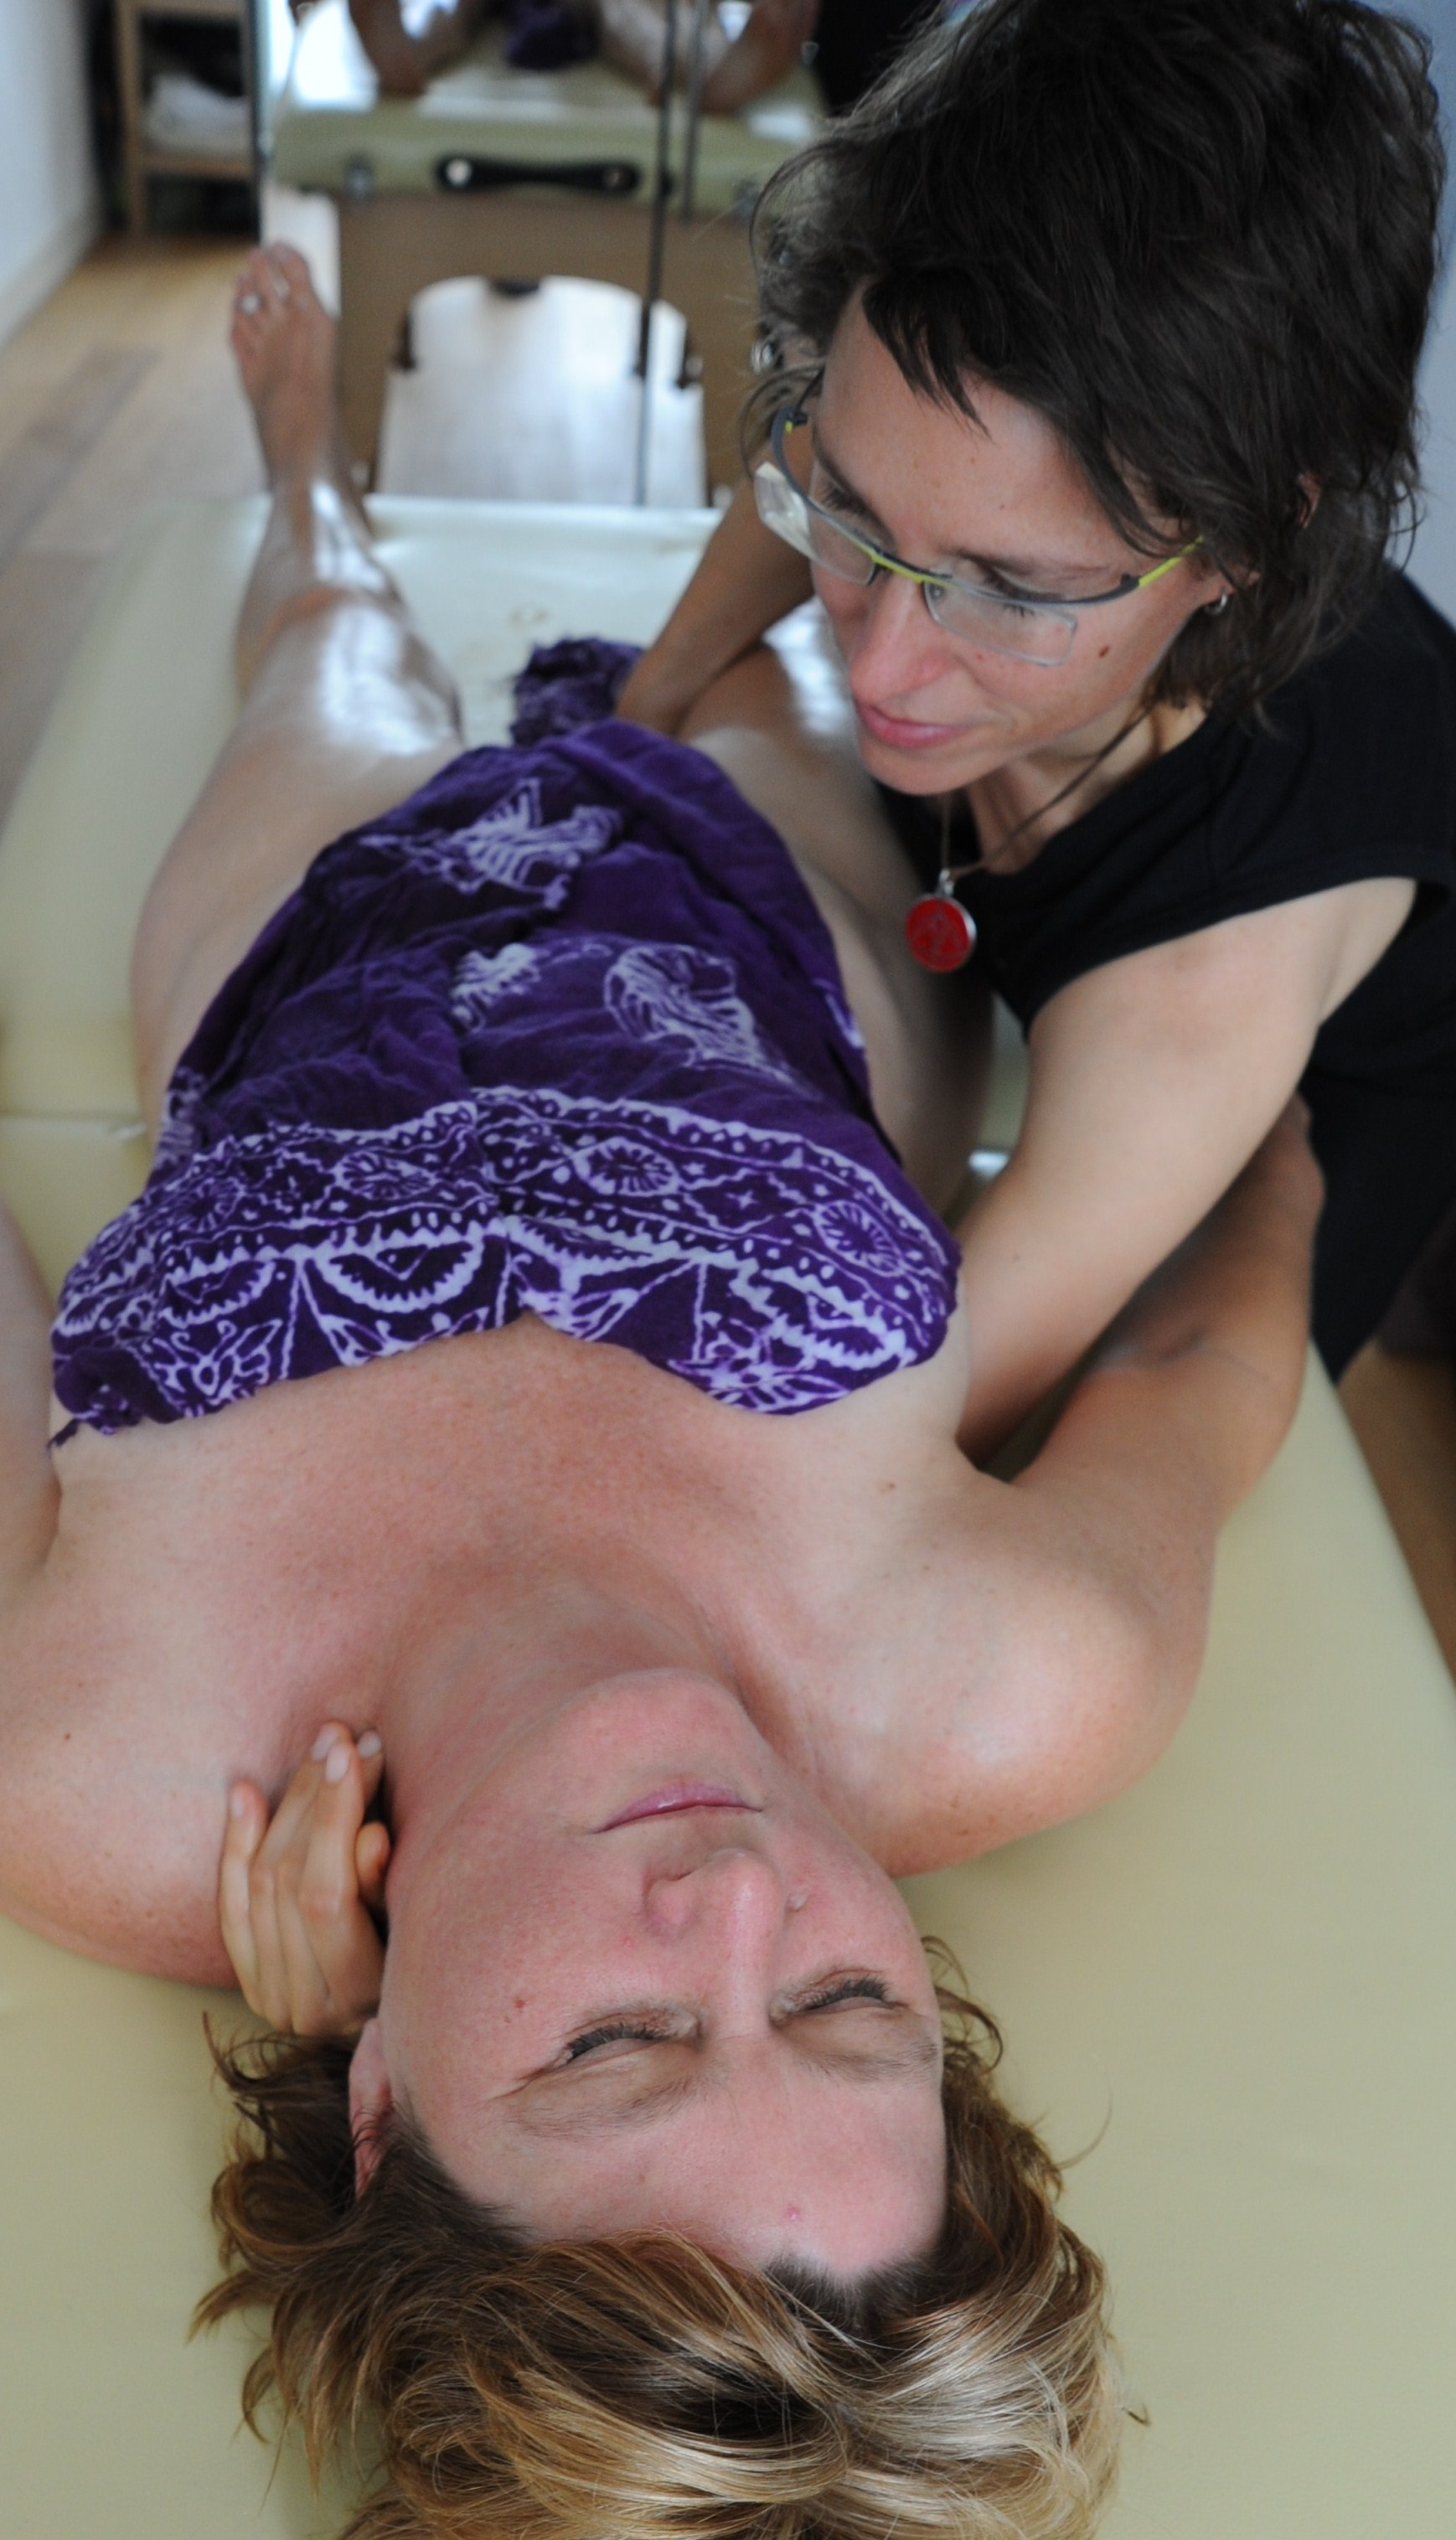 Den haag erotic massage